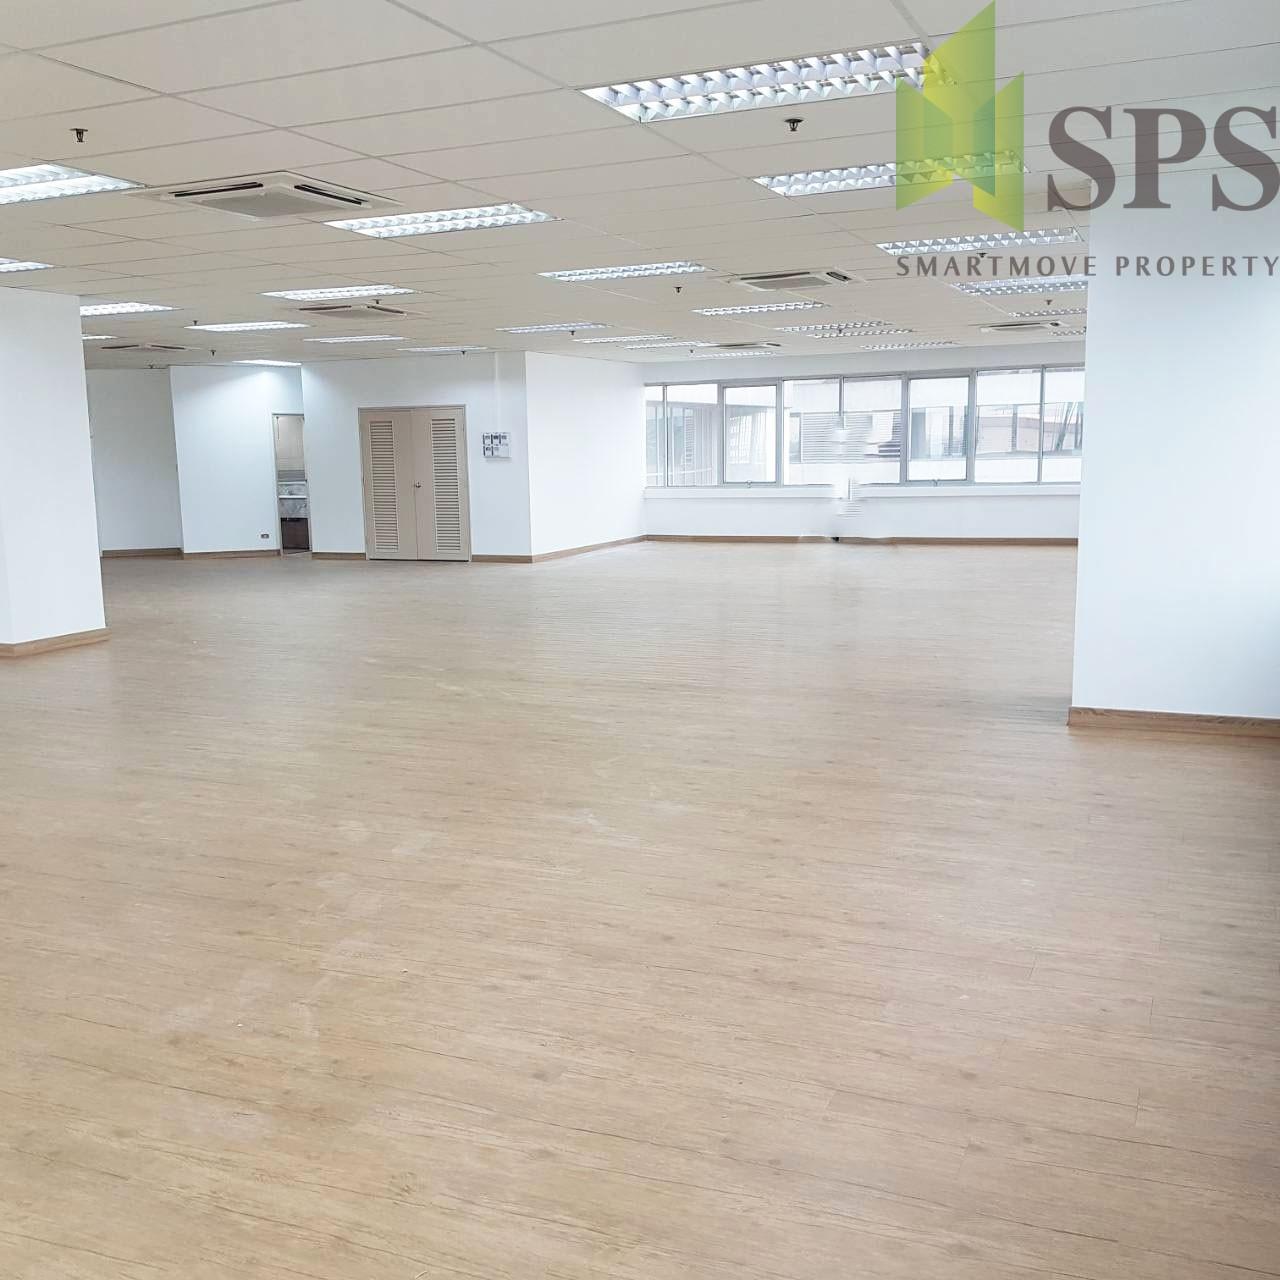 FOR RENT SV City Office Rama 3 สำนักงานให้เช่า (SPSCS084)